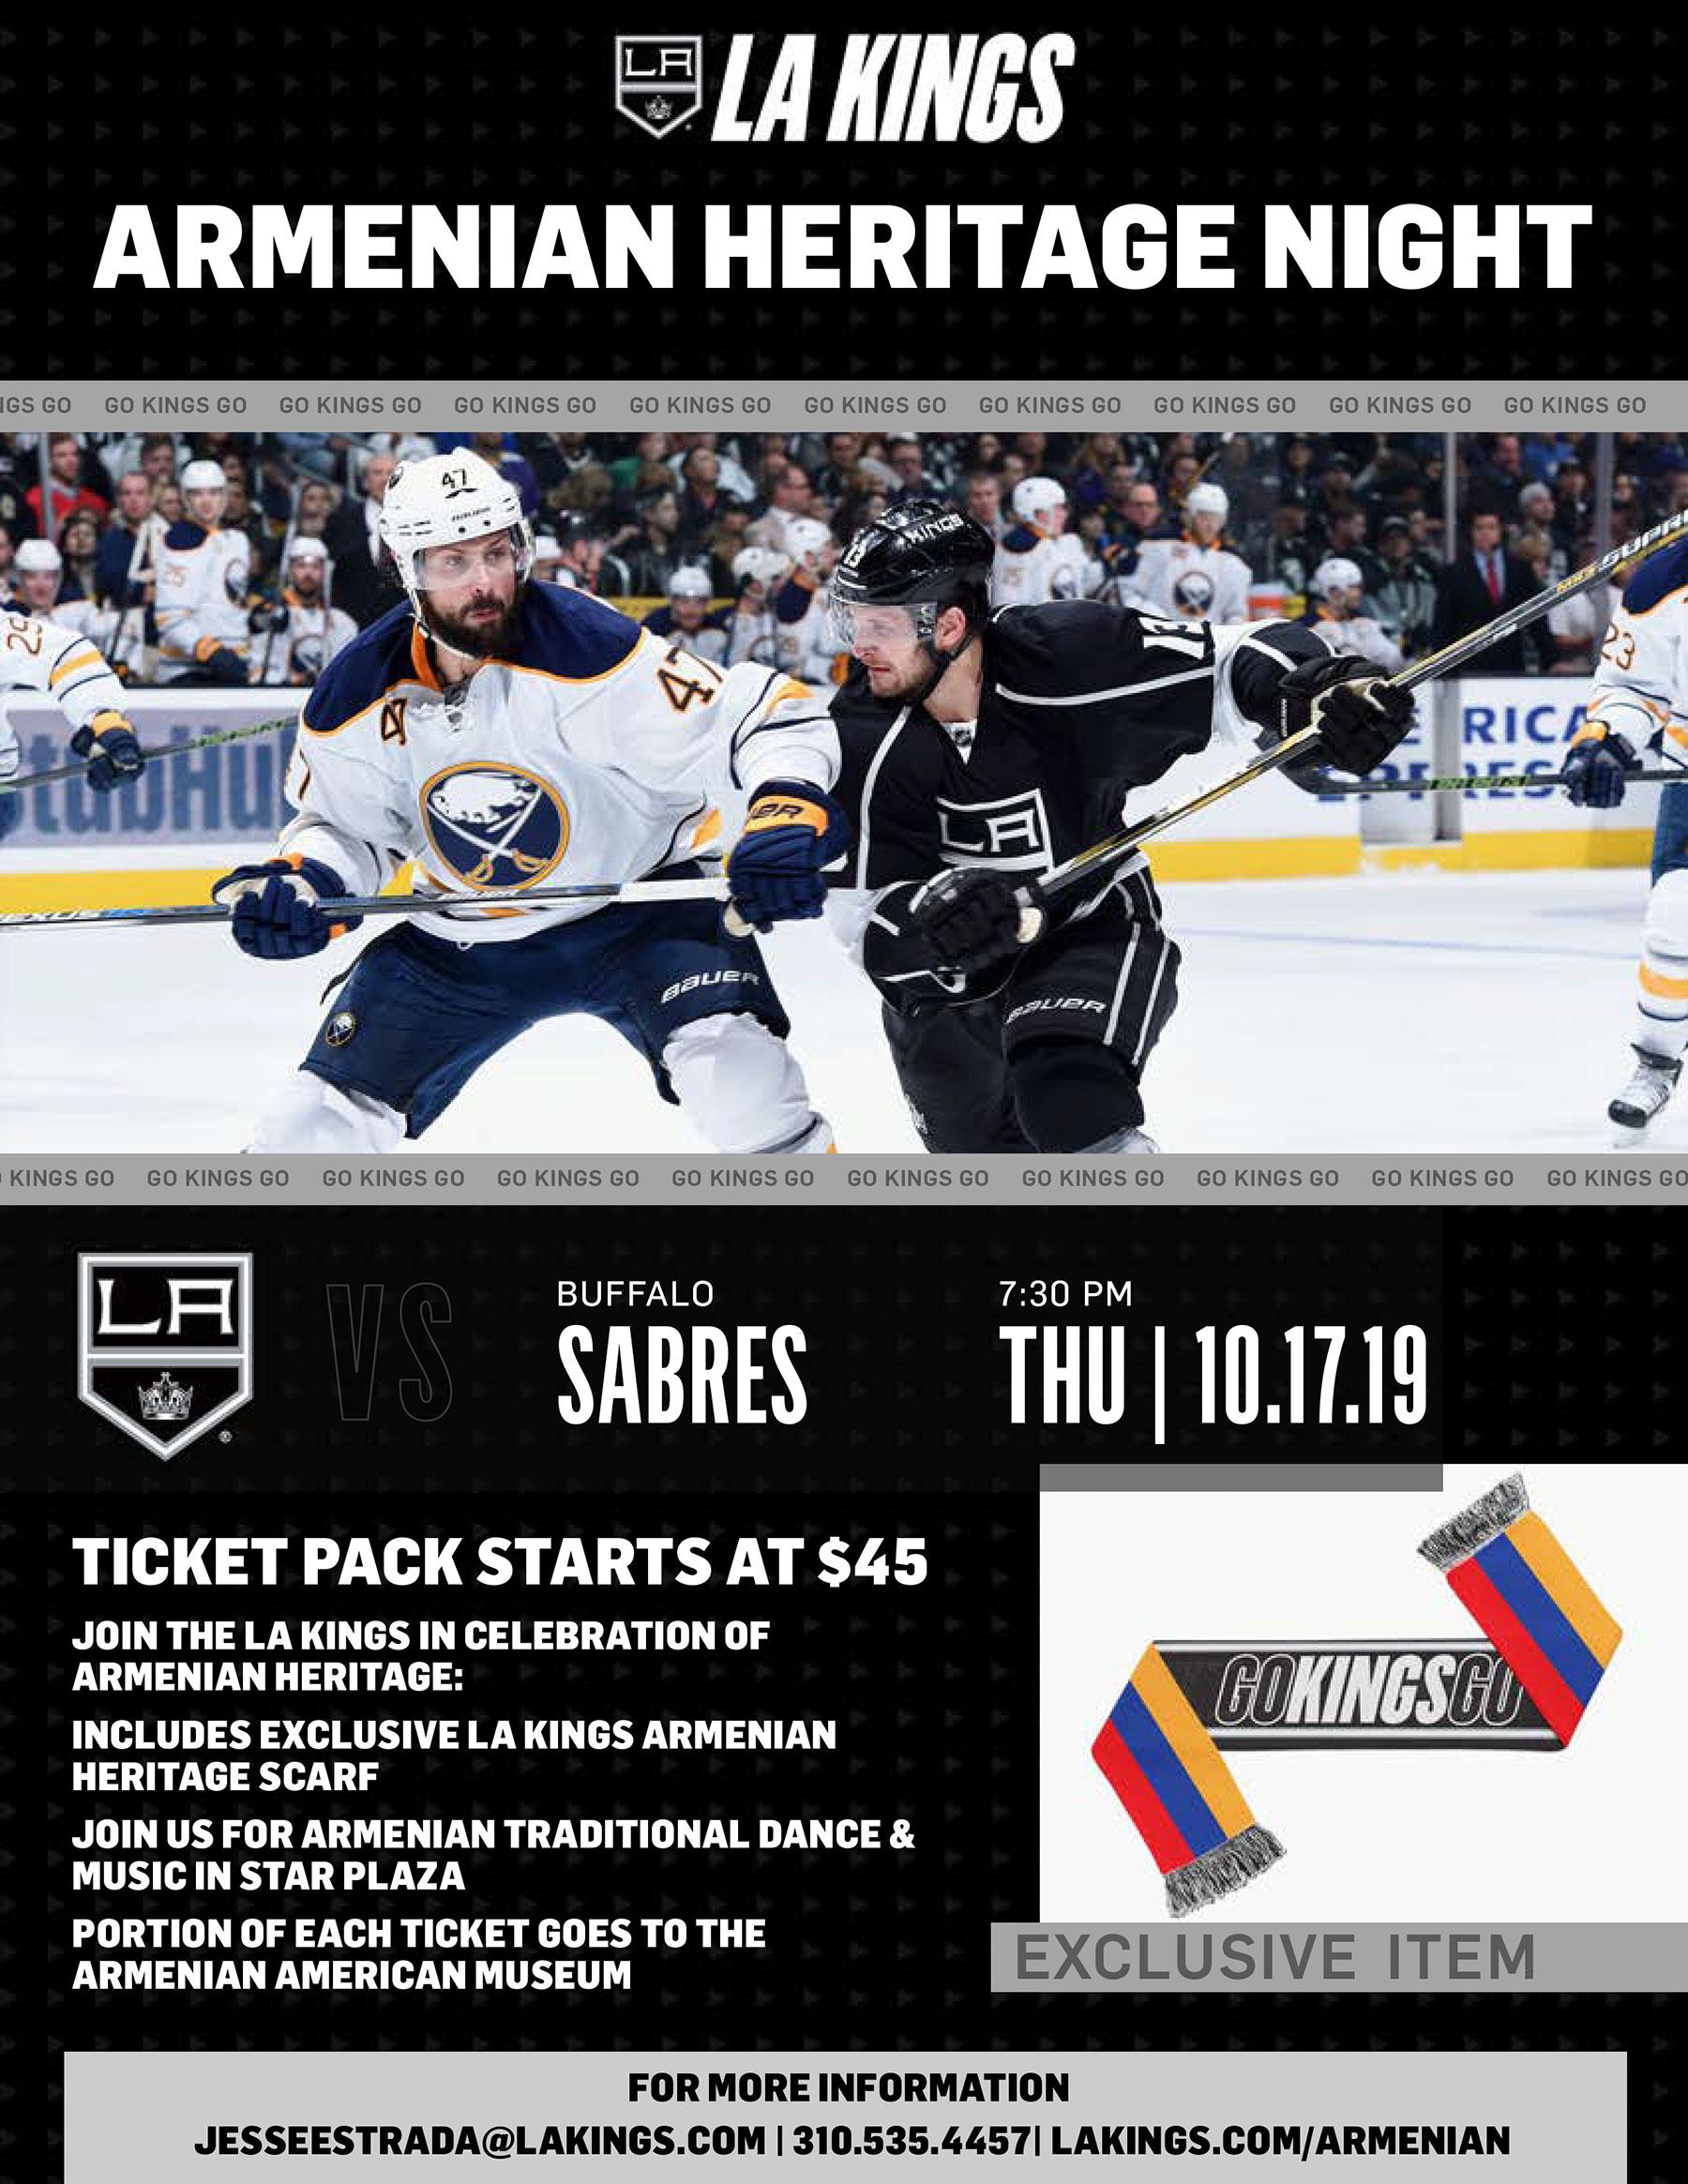 LA Kings Armenian Heritage Night Benefiting Armenian American Museum